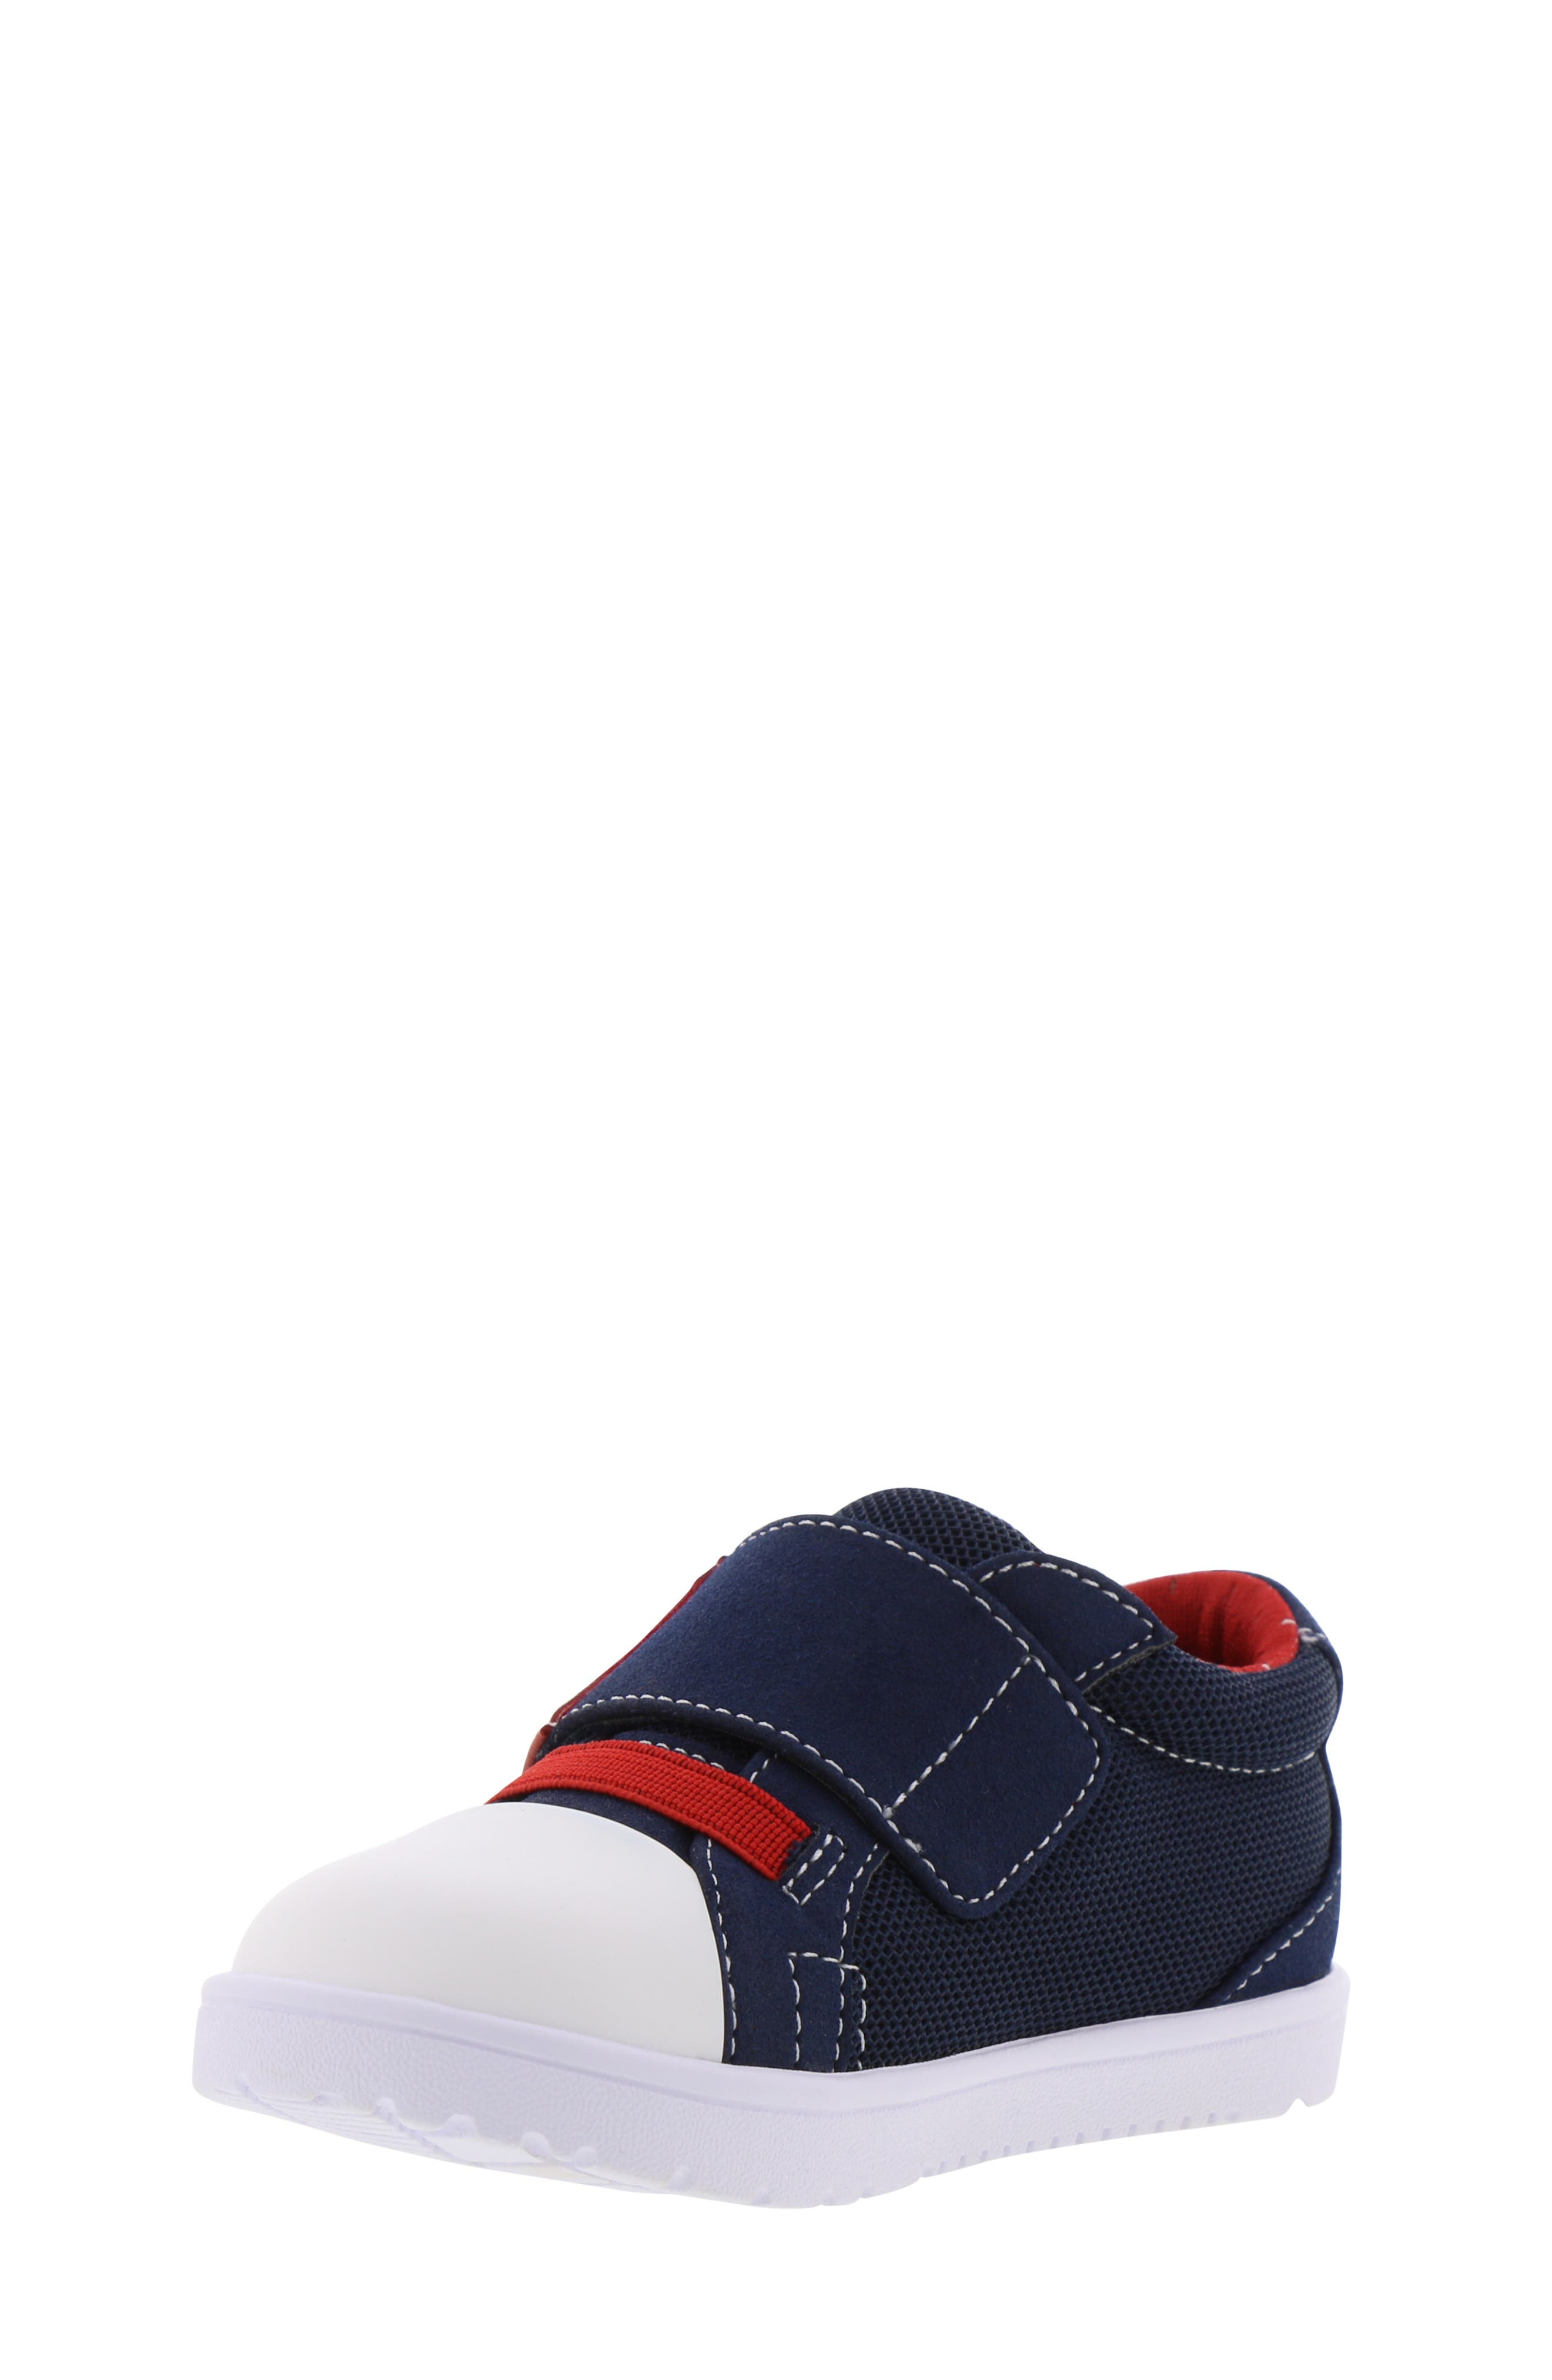 BØRN,                             Bailey Clark Sneaker,                             Alternate thumbnail 9, color,                             NAVY